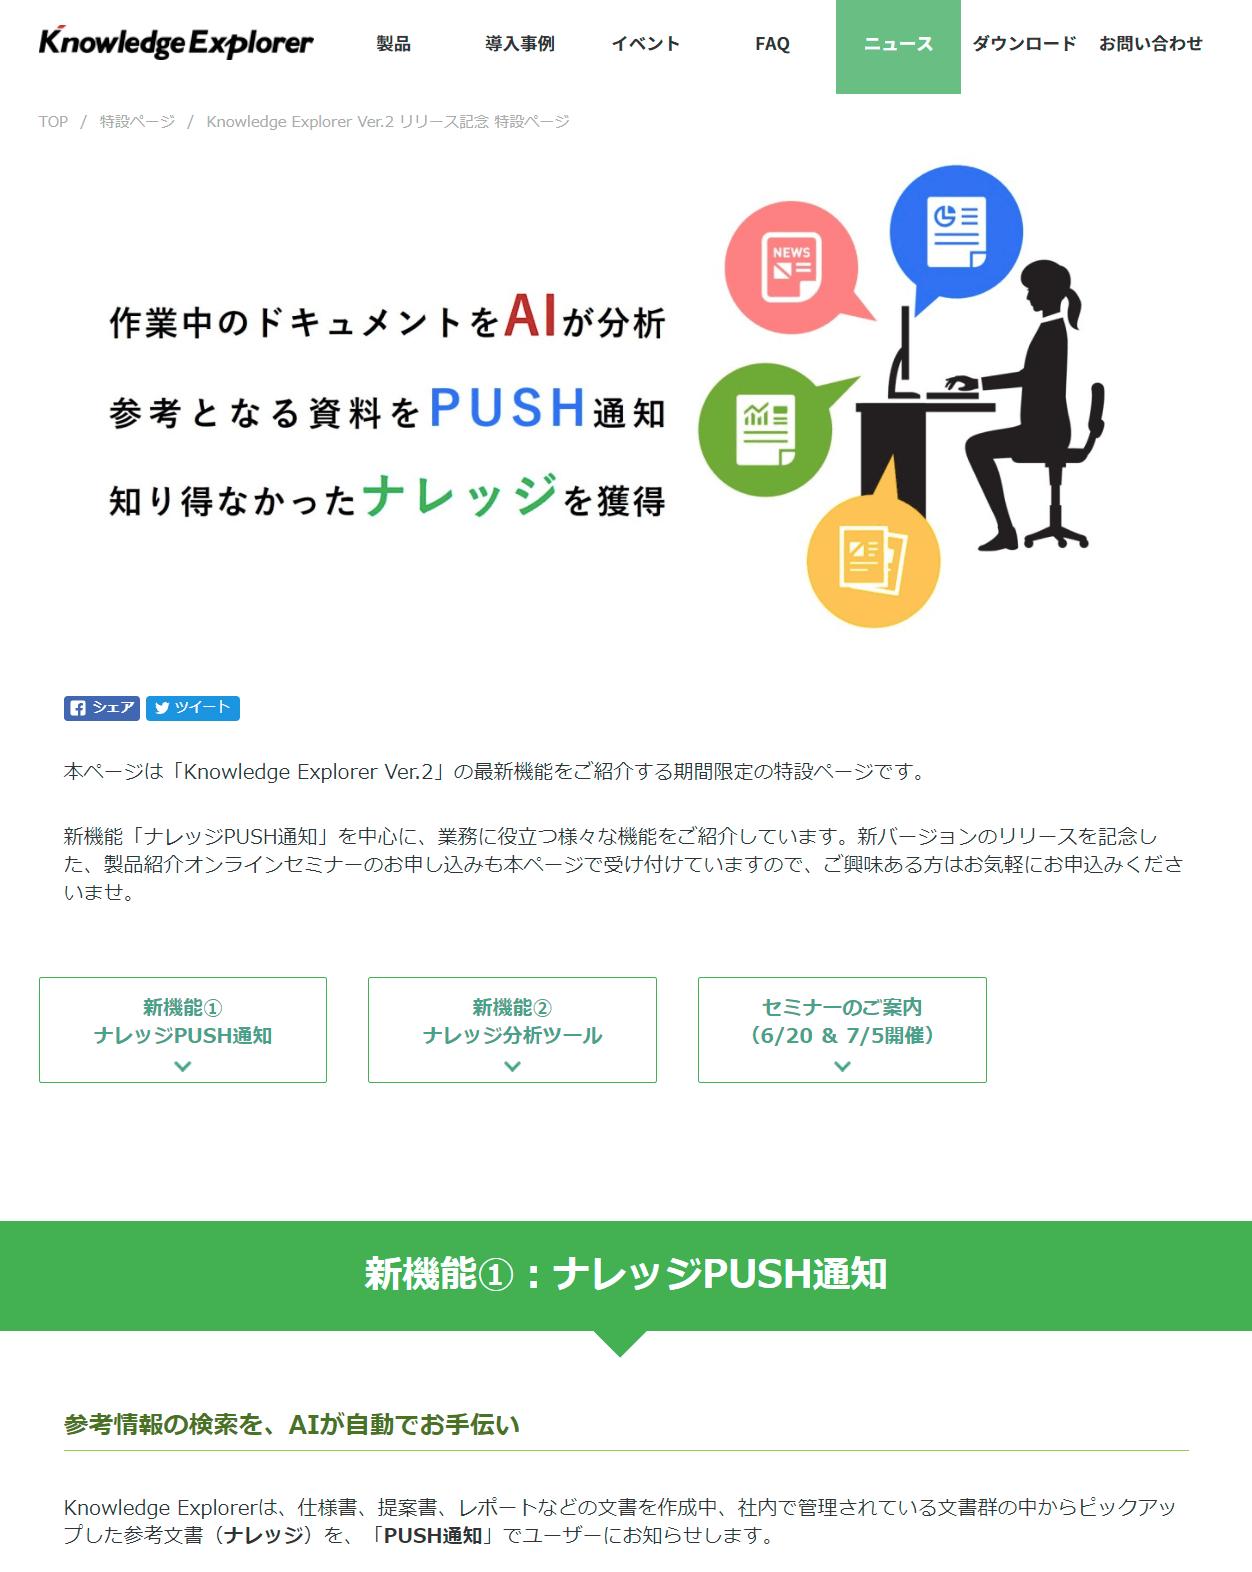 Knowledge Explorer Ver.2.0 リリース記念特設ページ